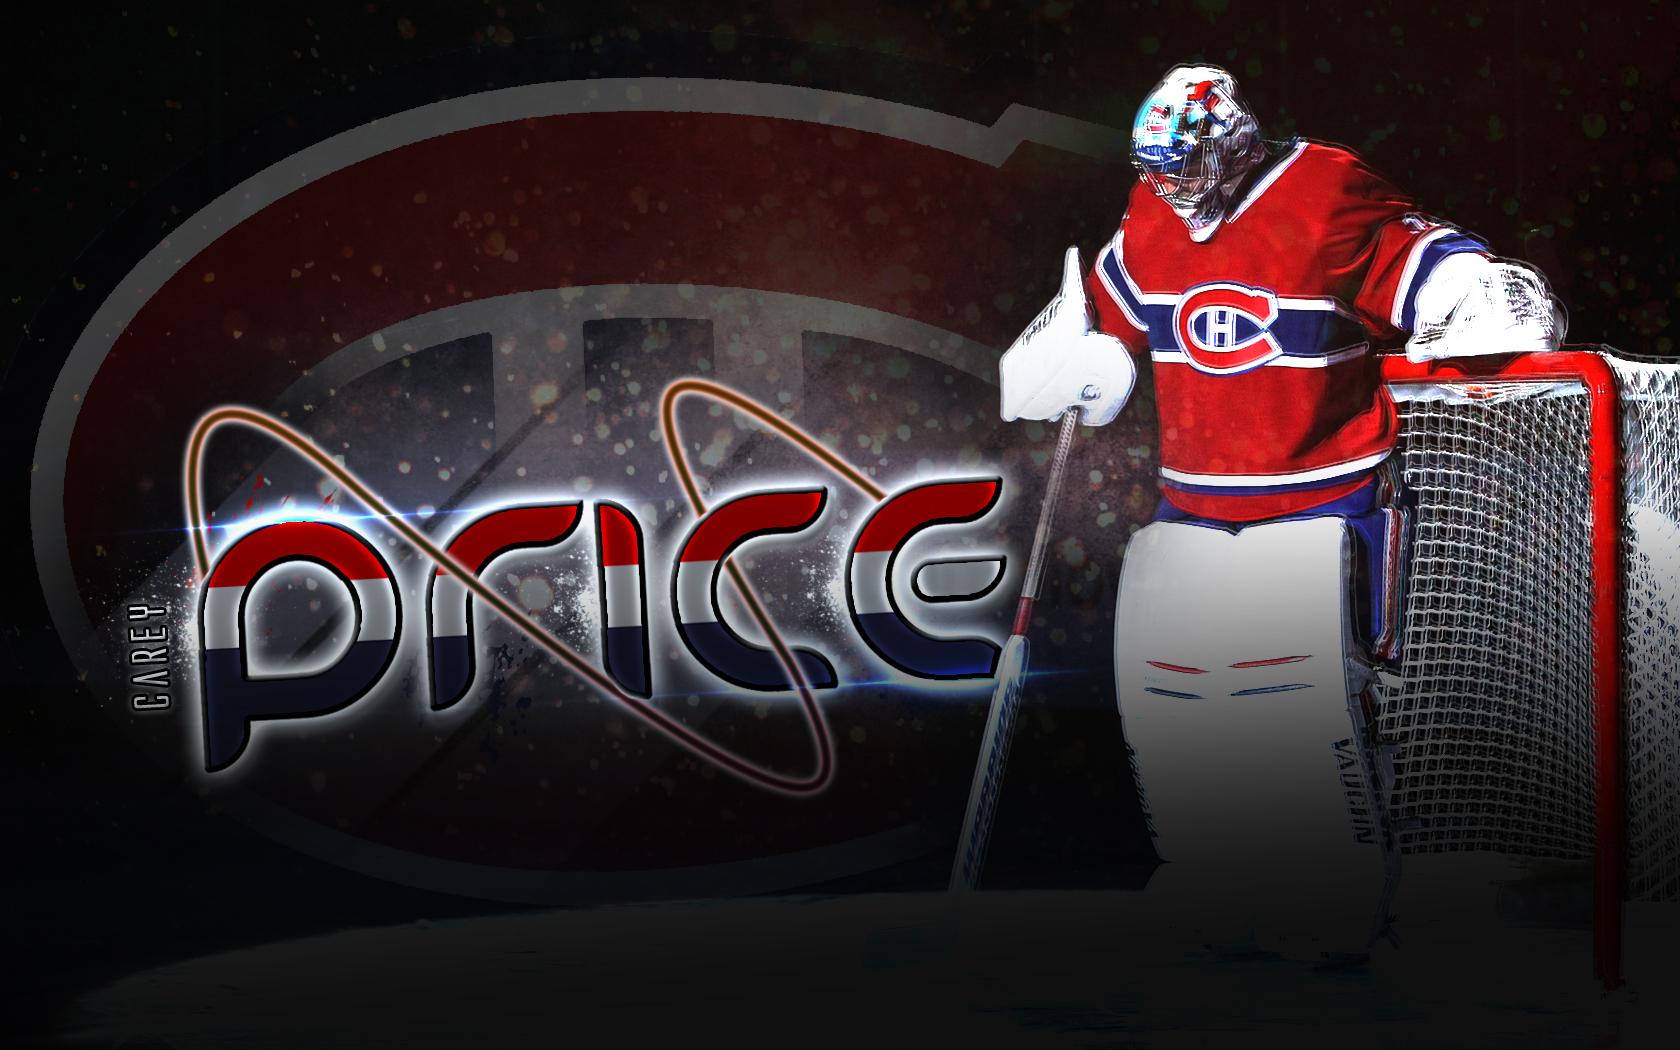 Carey price wallpapers montreal habs montreal hockey 9 html code - 0 Html Code Desktop Wallpaper Featuring Montreal Canadiens Goaltender Carey